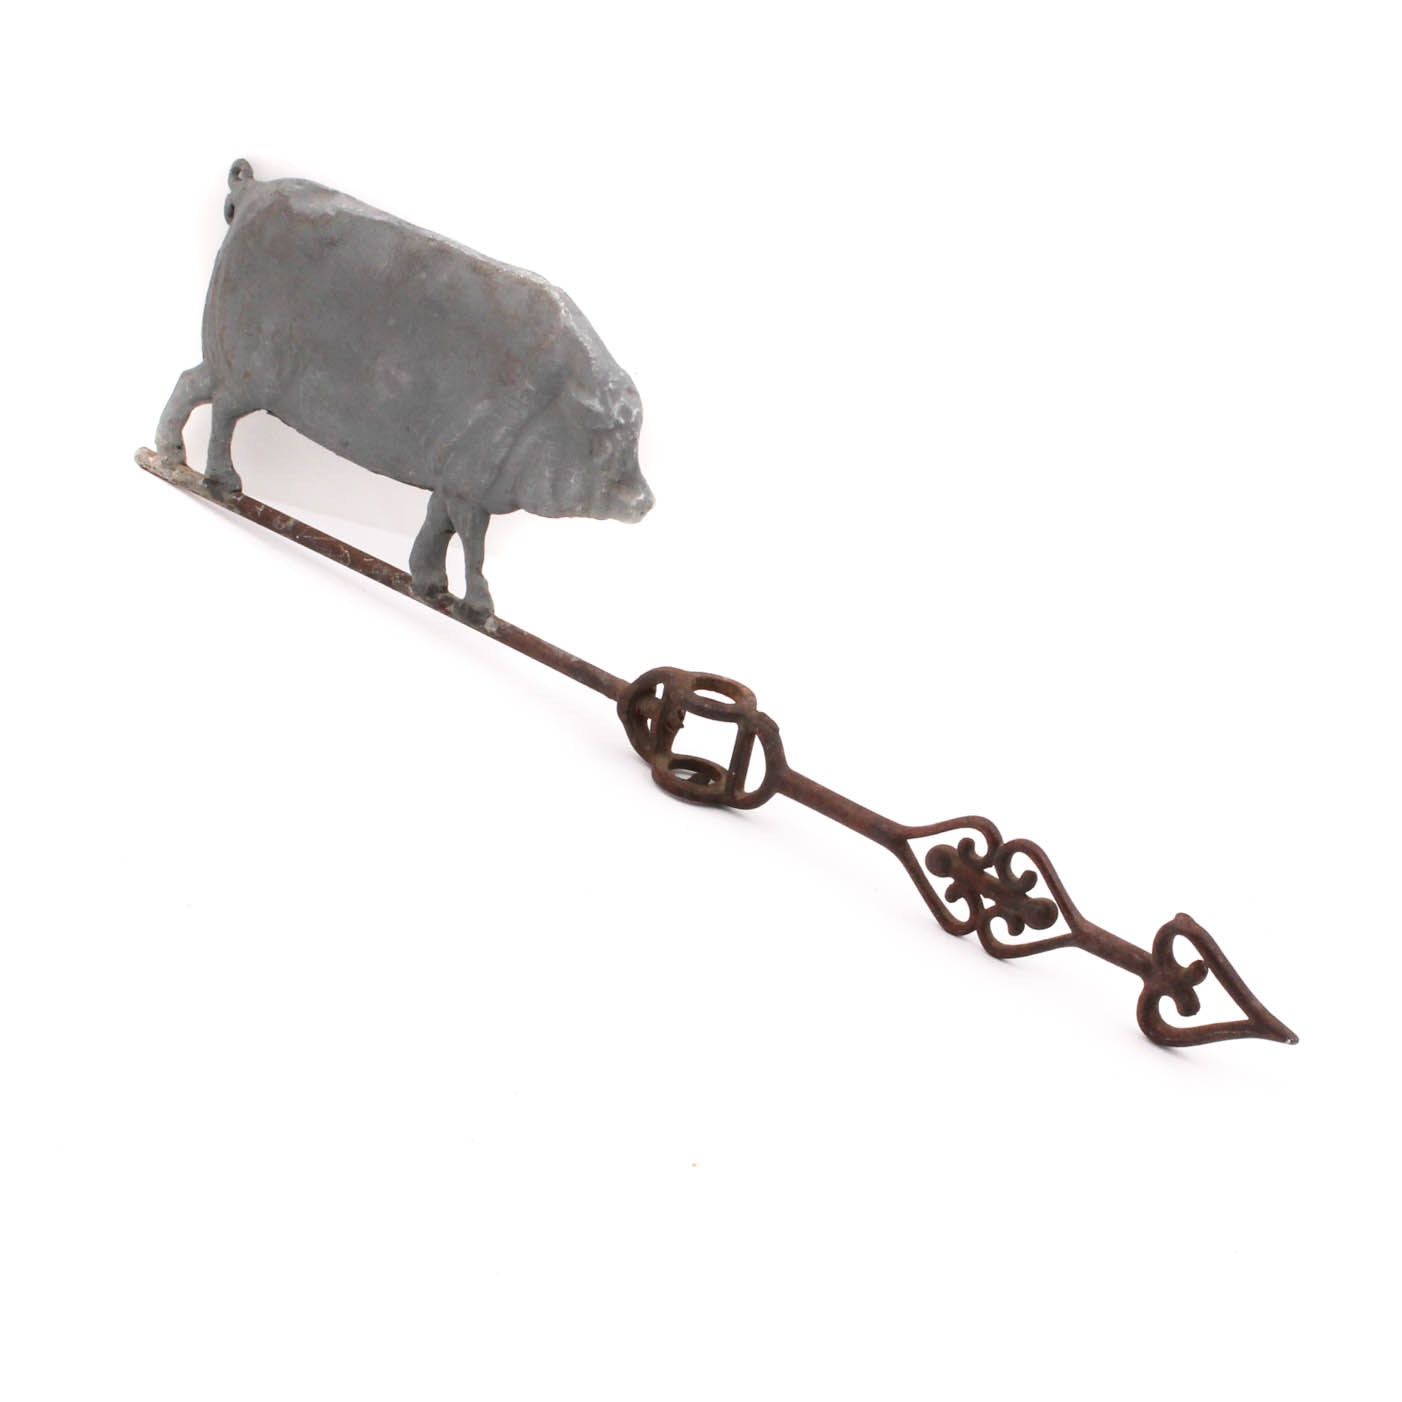 Antique Standing Pig Weathervane with Arrow